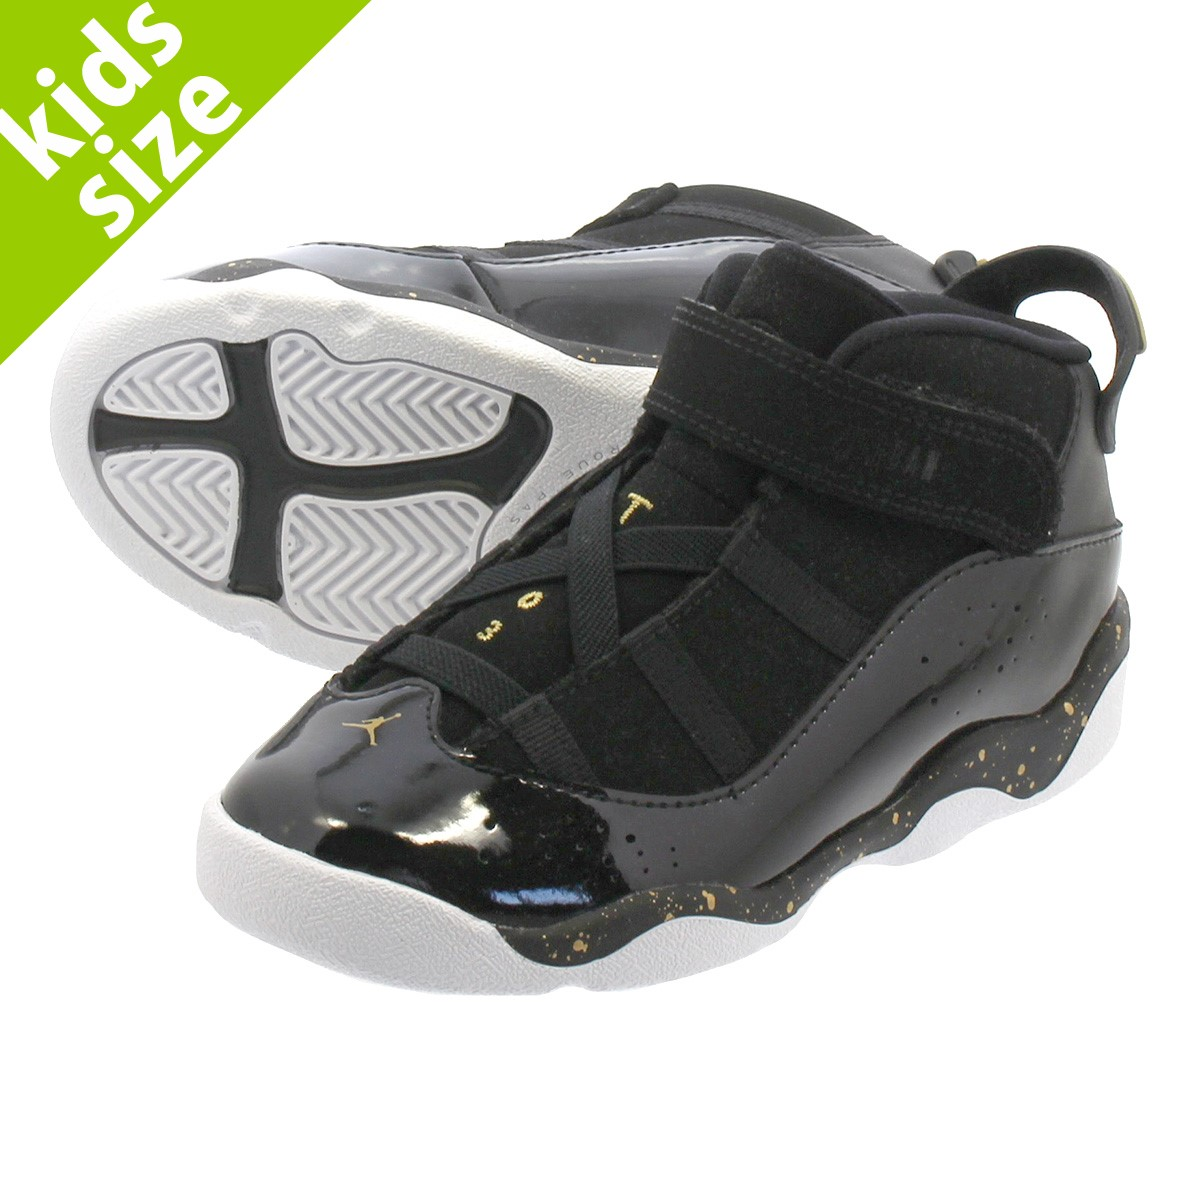 pretty nice a610a 9fa3e NIKE JORDAN 6 RINGS TD Nike Jordan 6 RINGS Co.,Ltd. TD BLACK/METALLIC  GOLD/WHITE 323,420-007